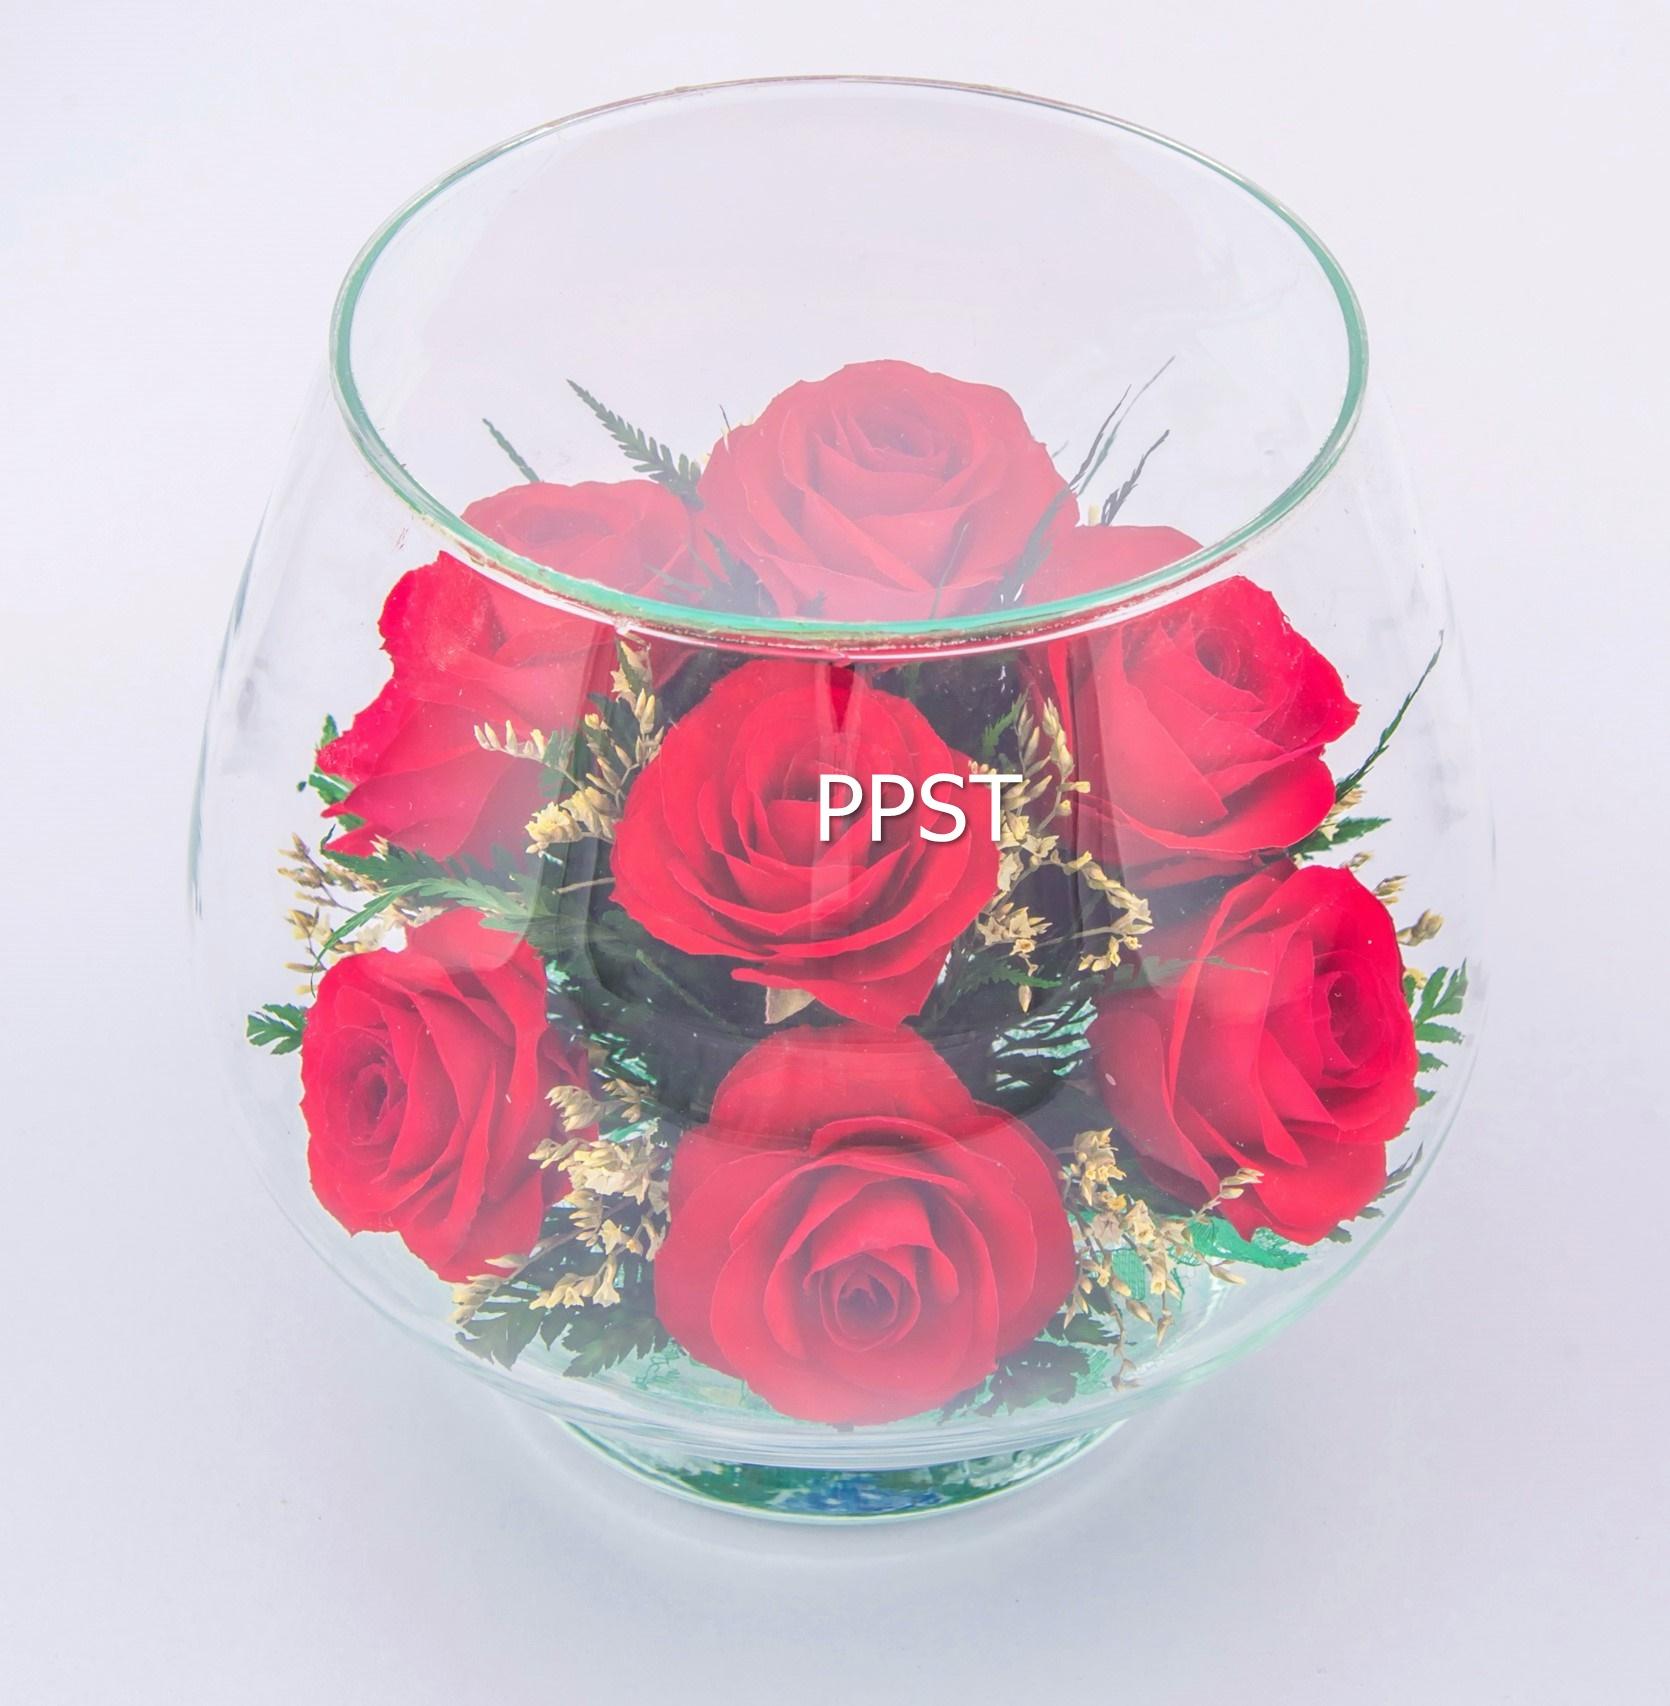 PS-RIG-26